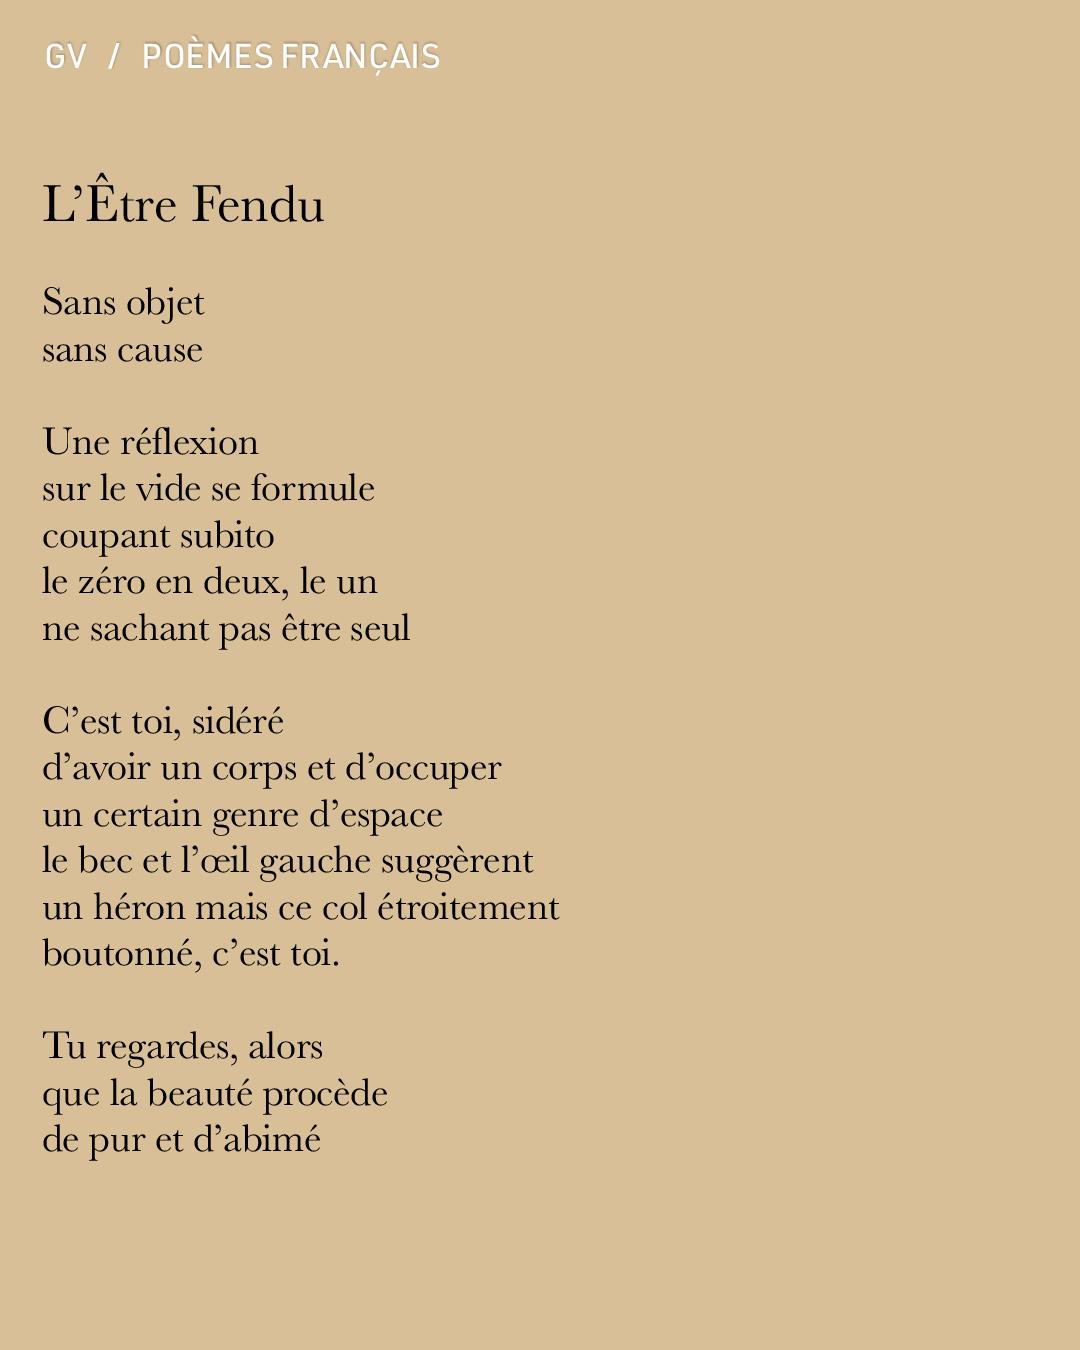 Gvion-PoemesF-LetreFendu.jpg